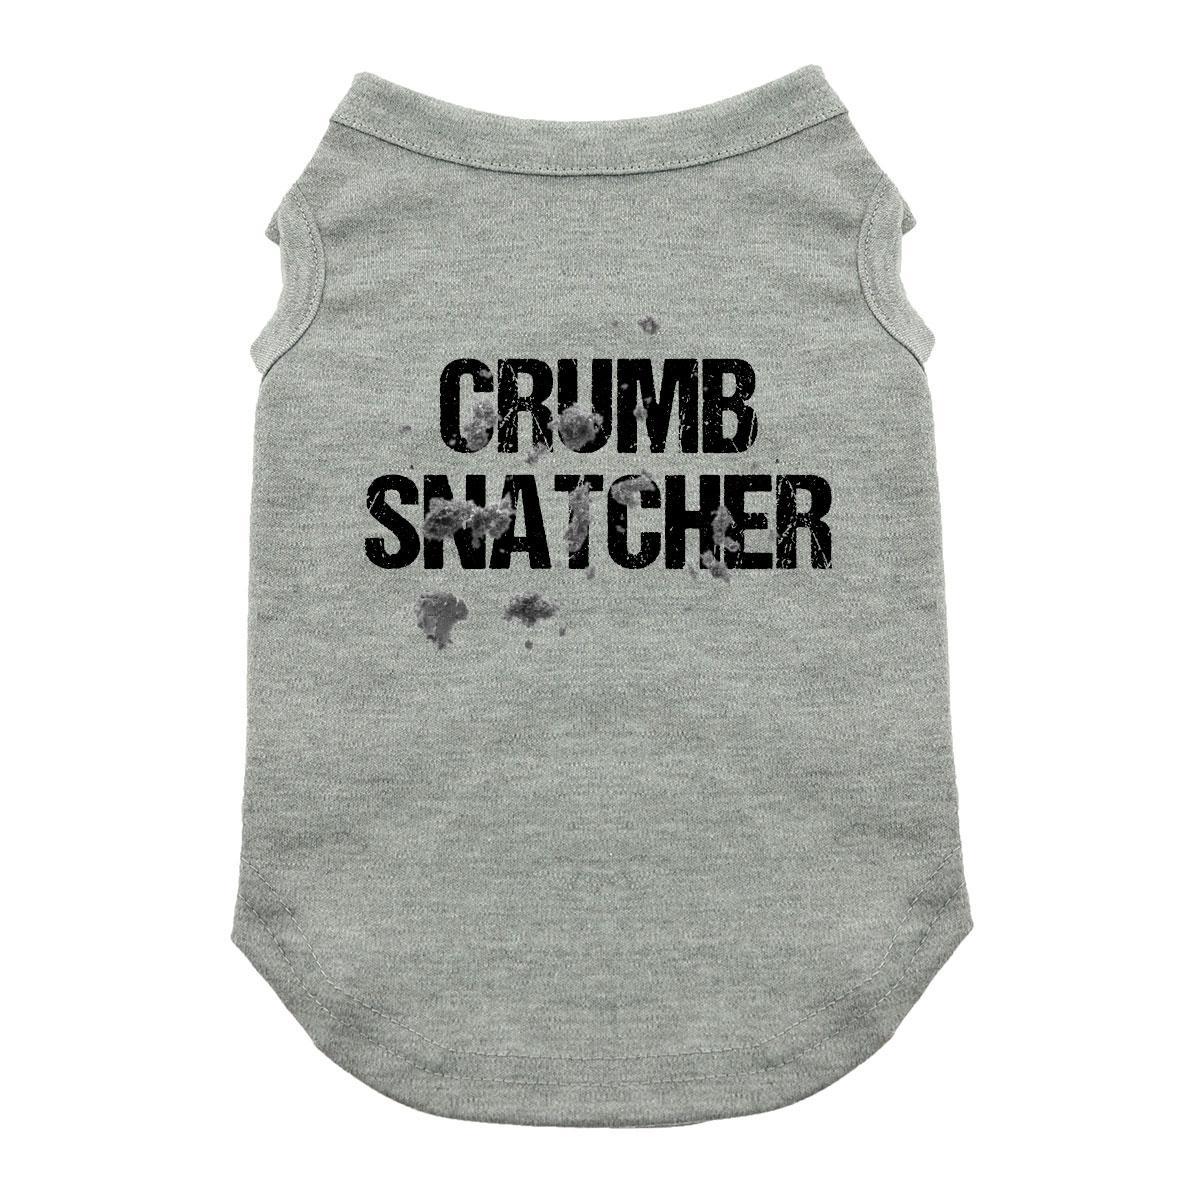 Crumb Snatcher Dog Shirt - Gray